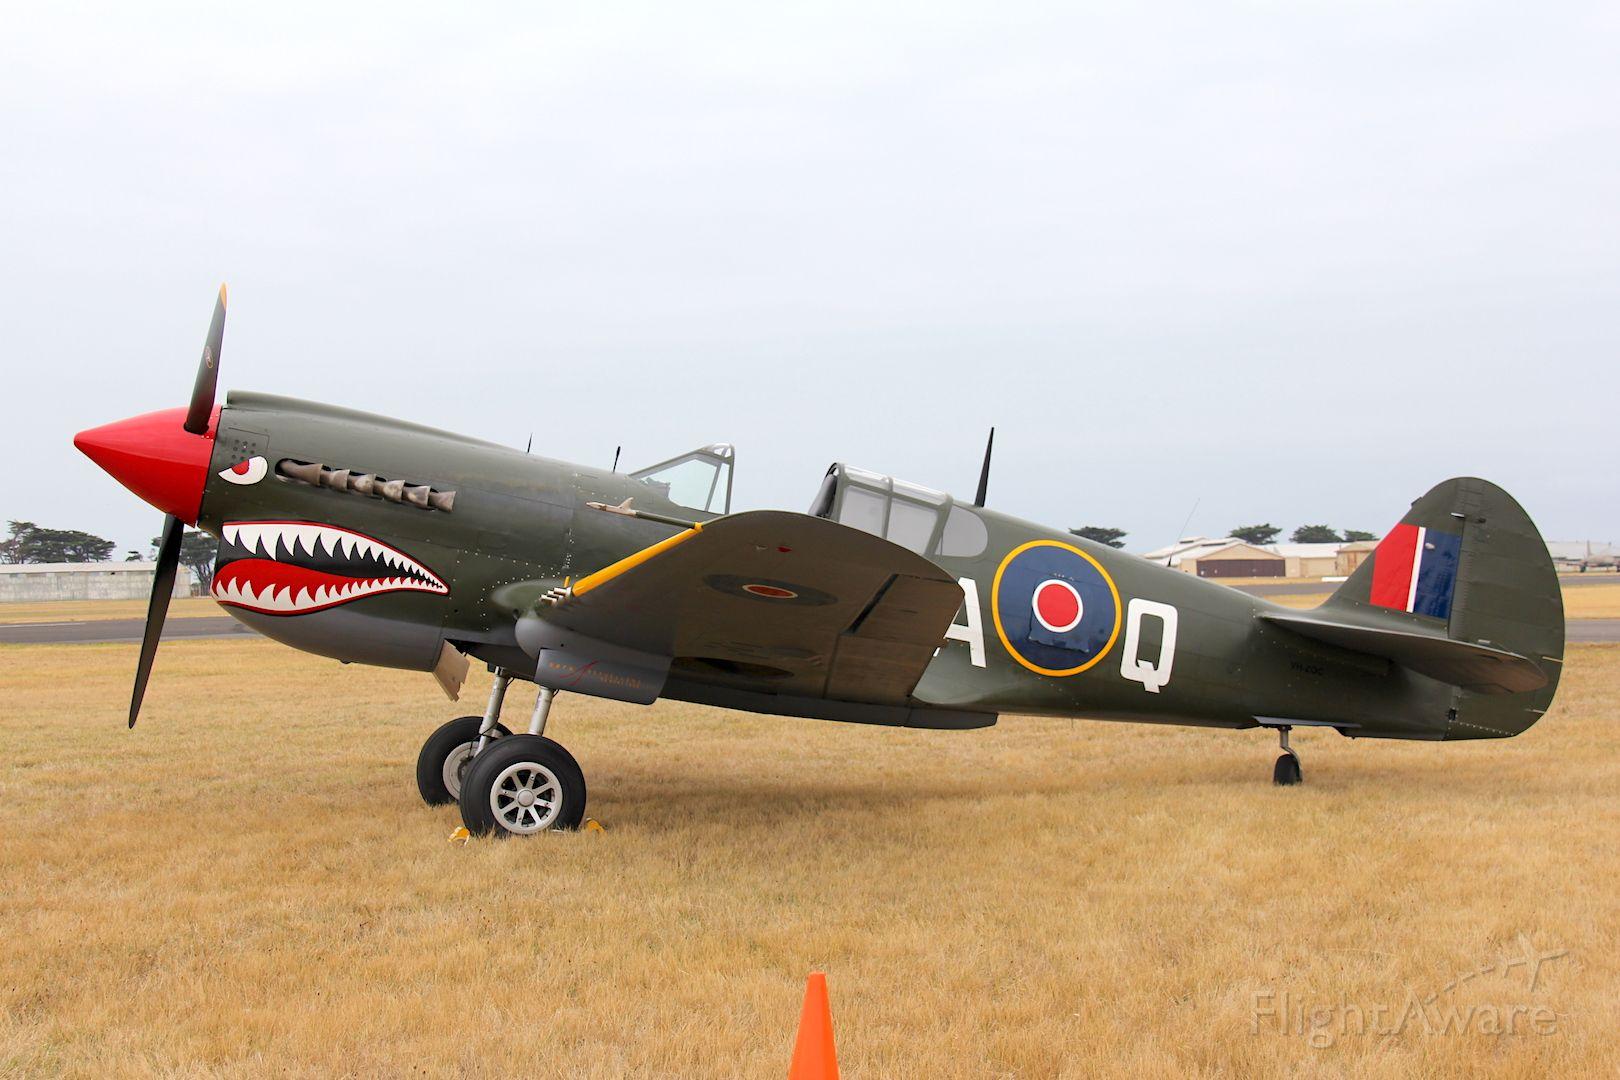 VH-ZOC — - Curtiss P-40N Warhawk<br />Manufactured in 1943, USA<br />Photo: 01.03.2014